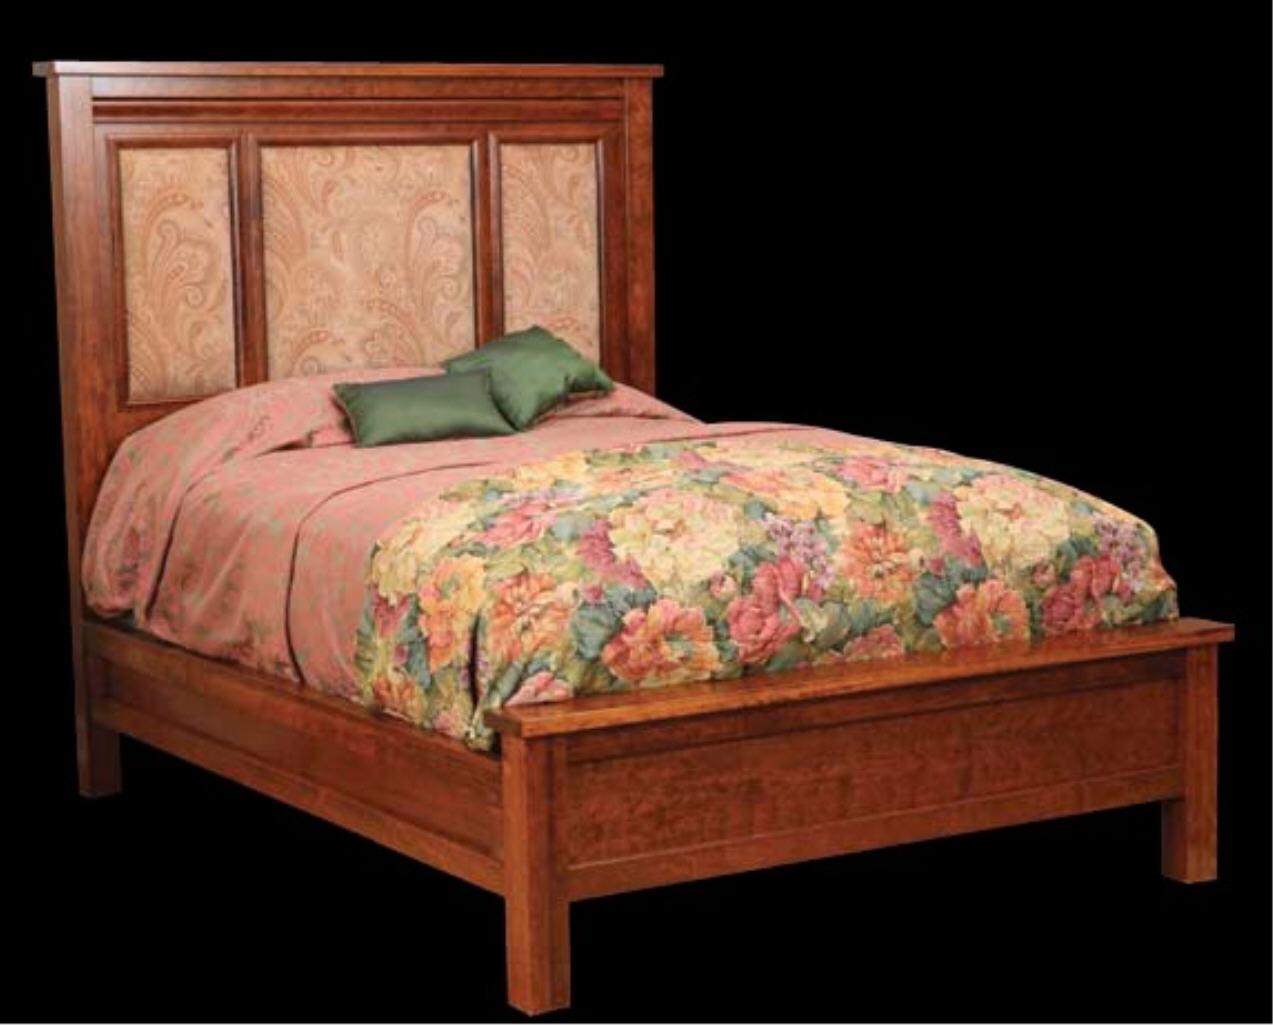 Tremendous Marrakesh Bed W Fabric Download Free Architecture Designs Scobabritishbridgeorg